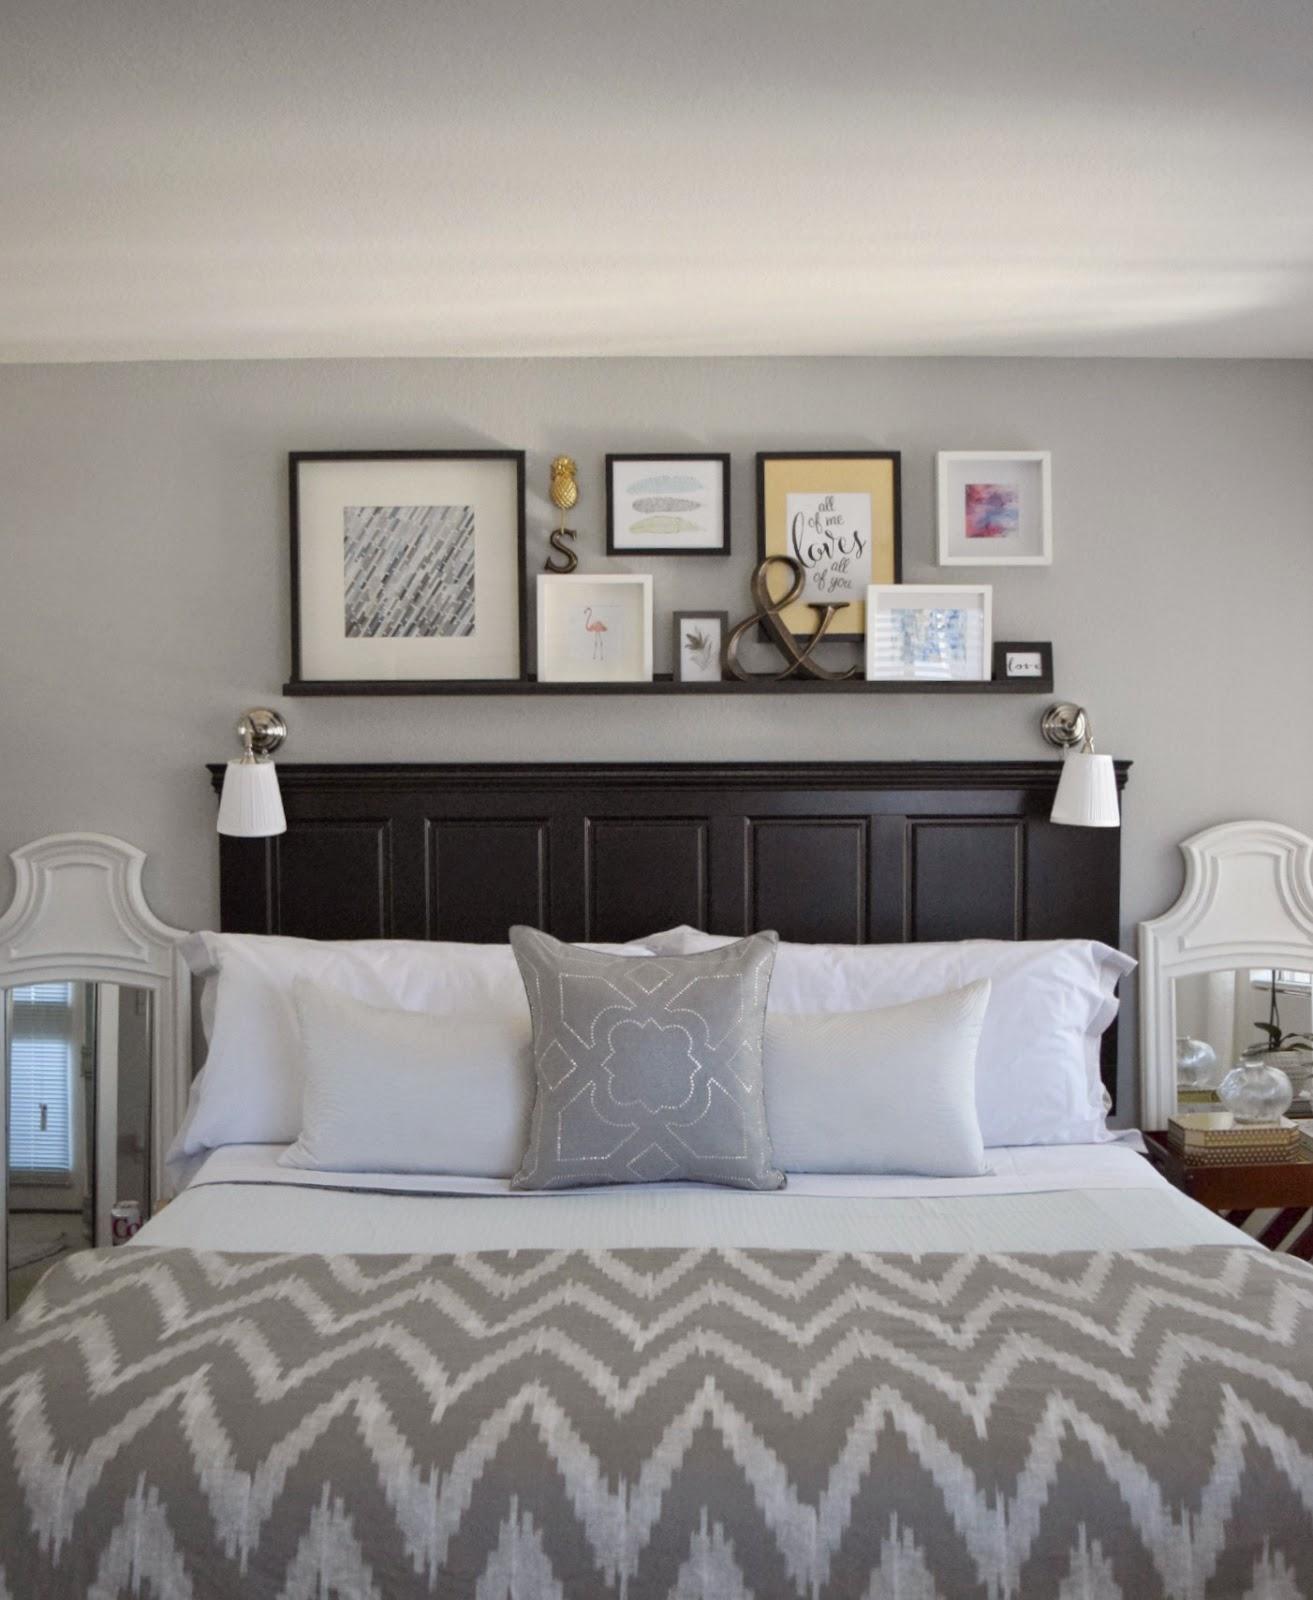 Made2Make: Hotel Bedding At Home